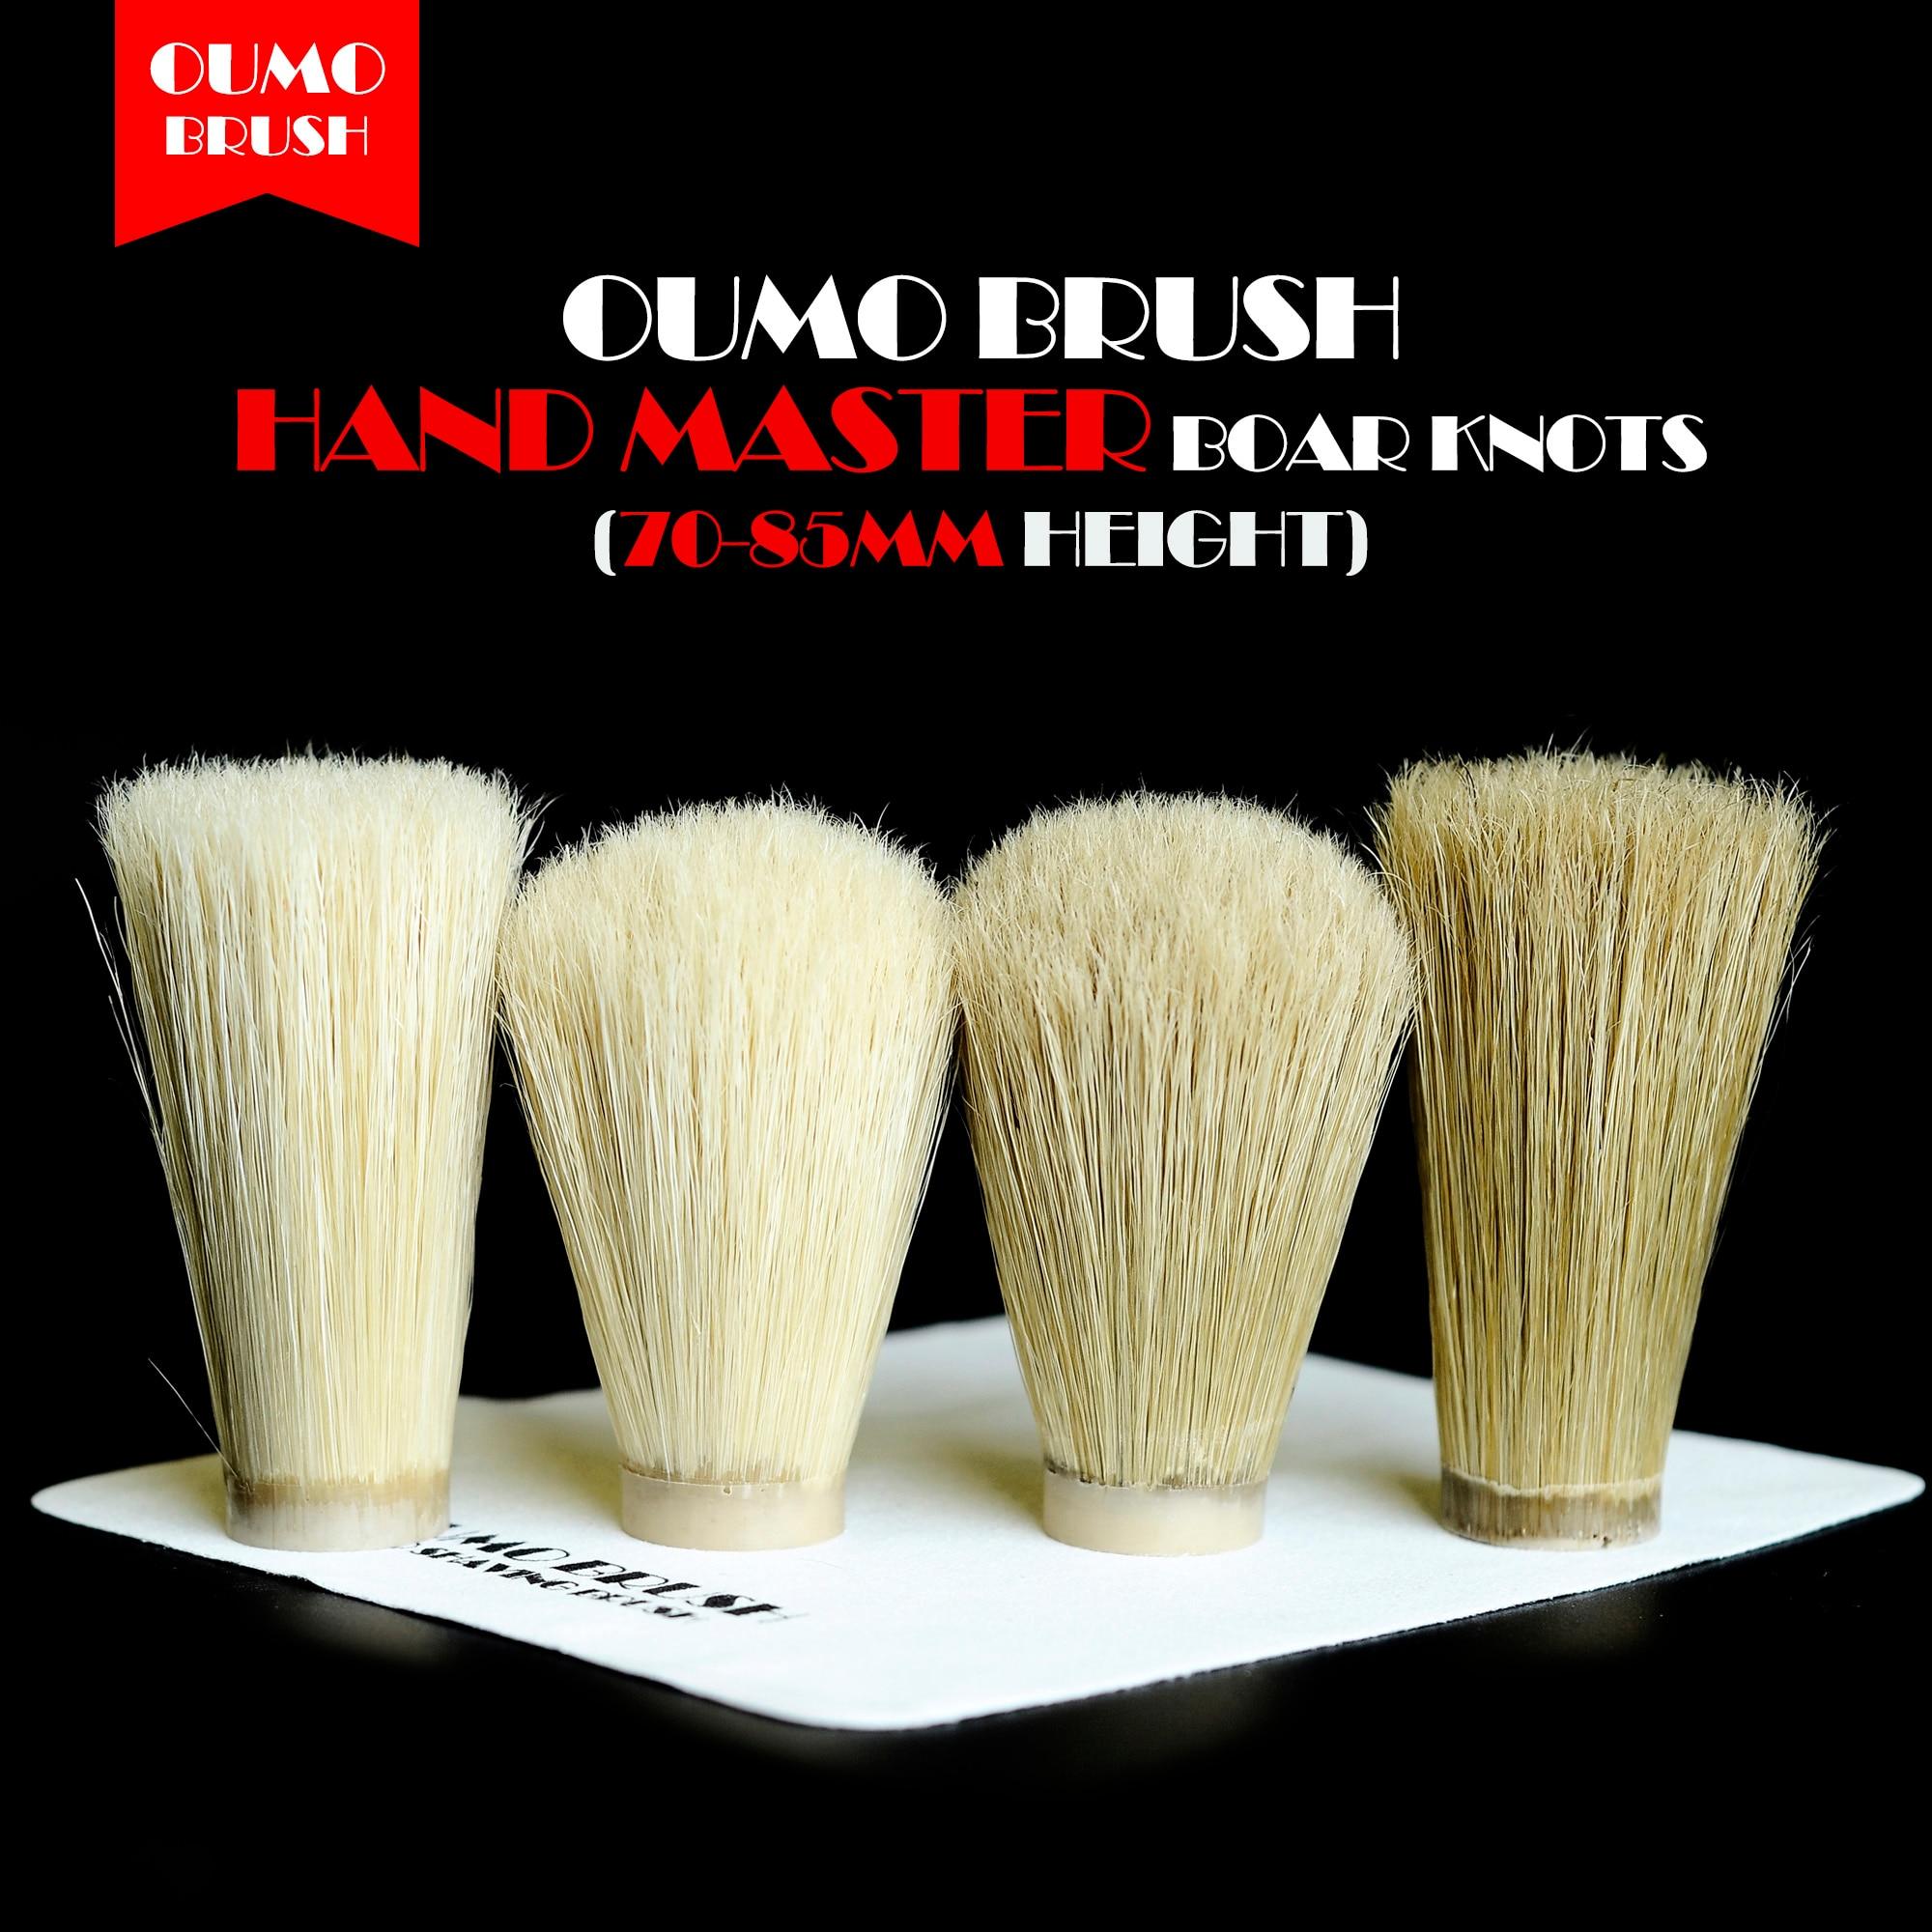 OUMO BRUSH- Boar Bristle Hair Knot Boar Shaving Brush Knot